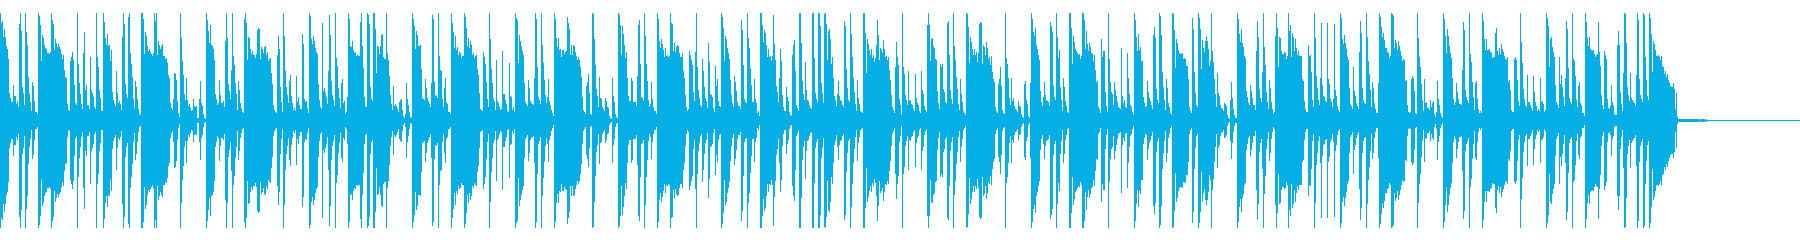 145 BPMの再生済みの波形